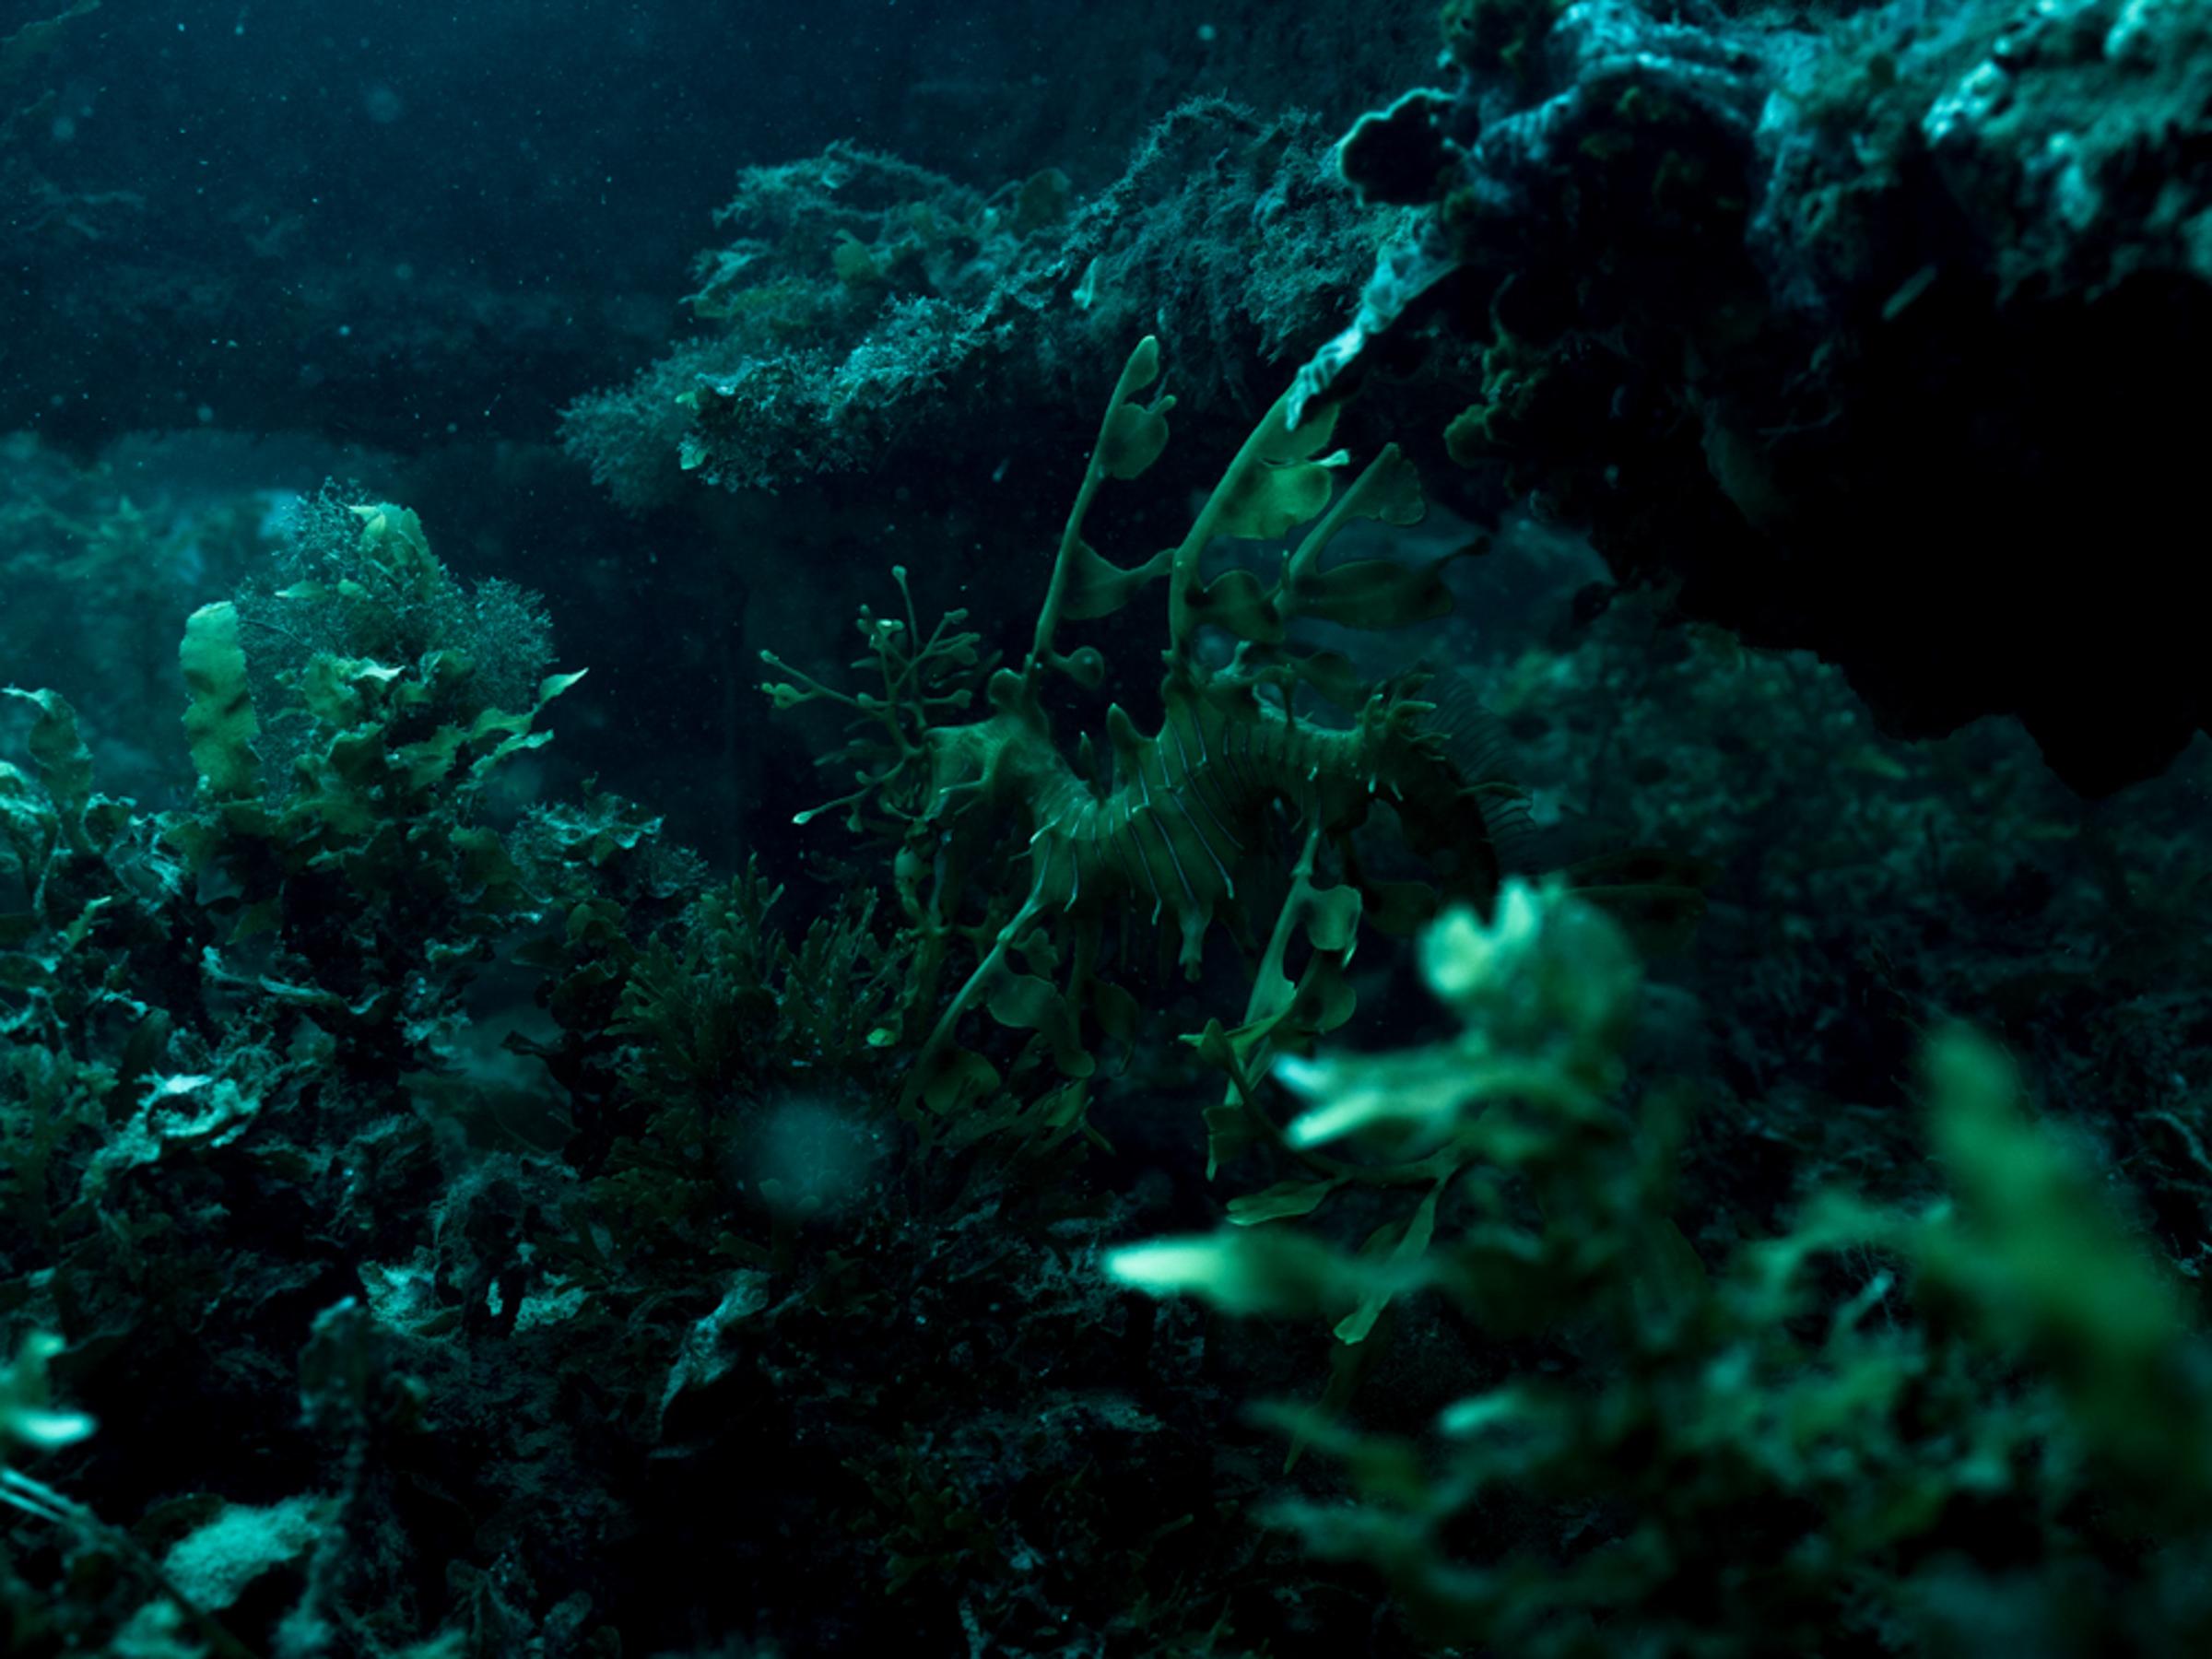 Leafy Sea Dragon - Rapid bay  Michaela Skovranova / Greenpeace